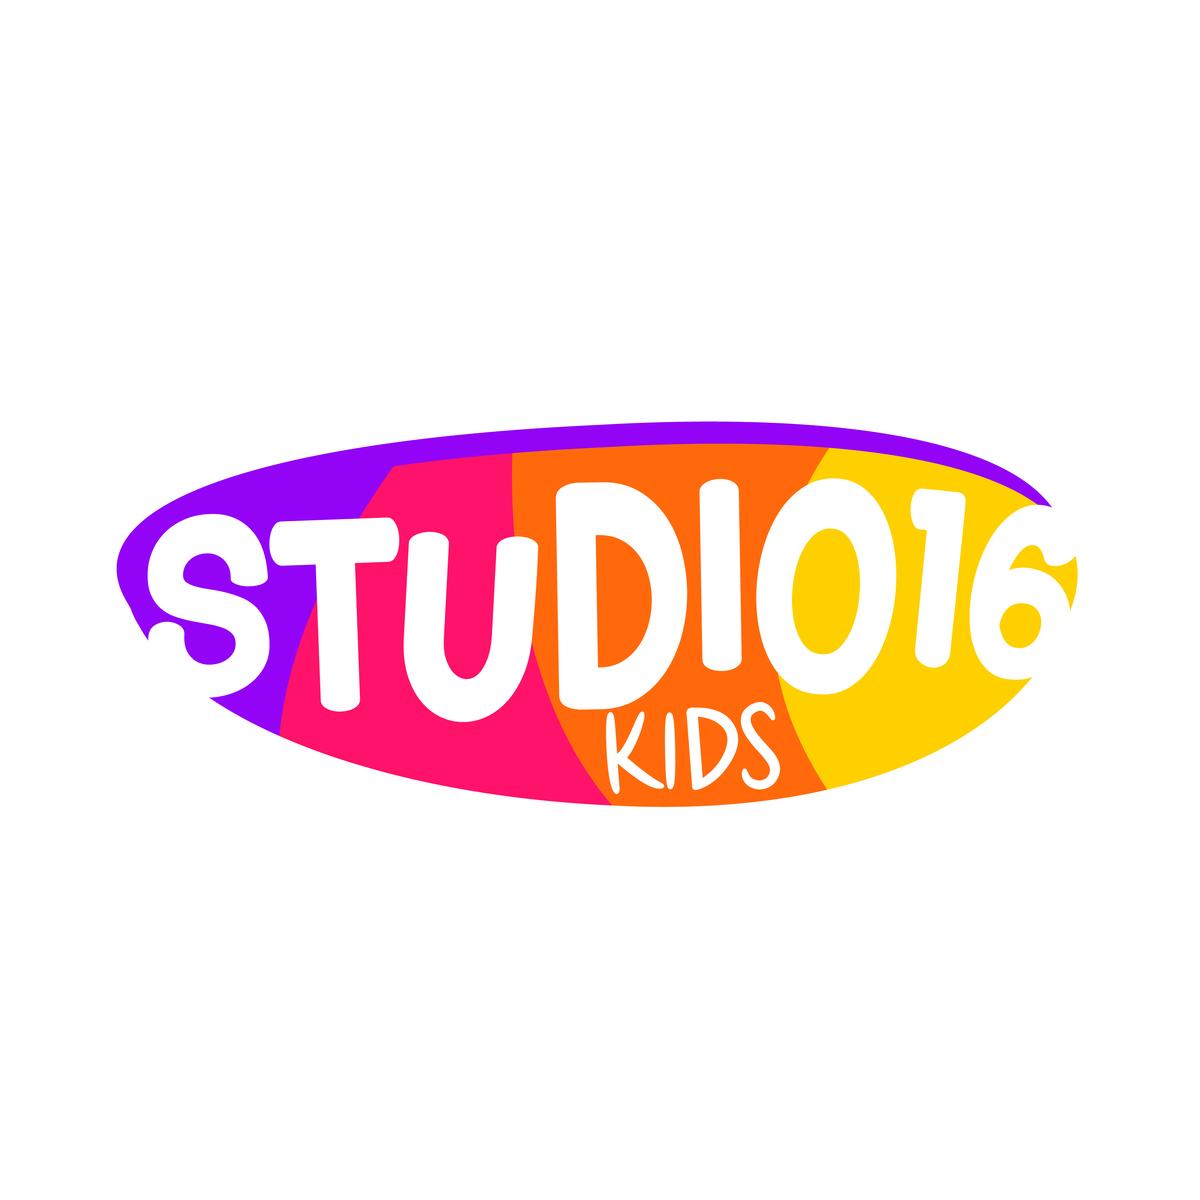 Imagem capa - Studio16 Kids por Studio16 Fotografia